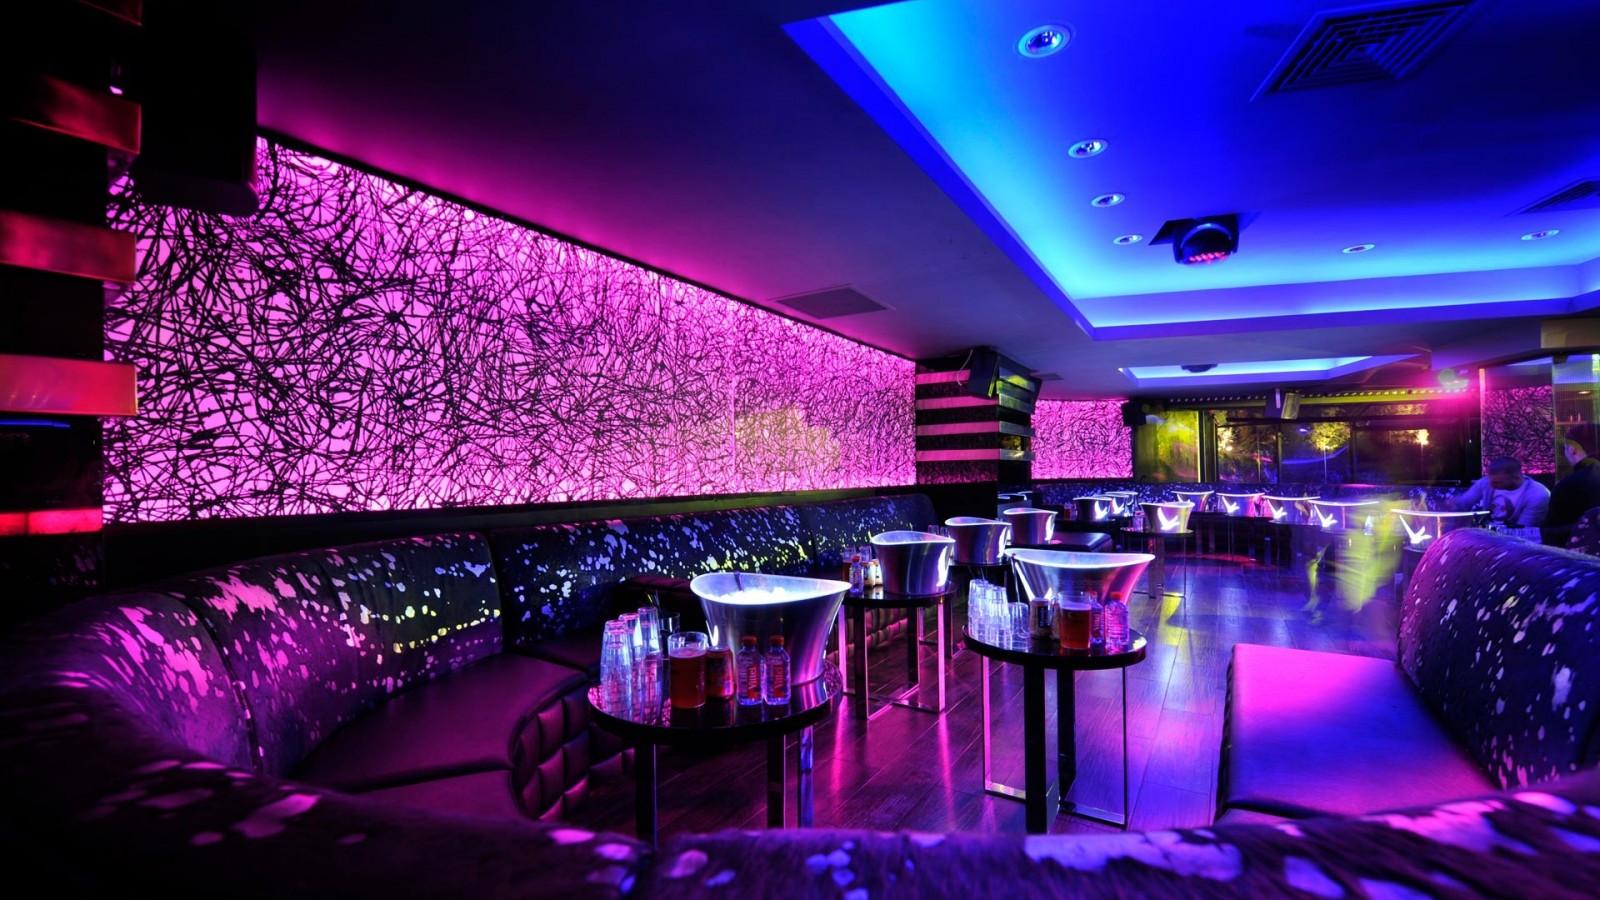 Design bar lighting night club neon lights by chaosangelmoon on design bar lighting night club neon lights by chaosangelmoon aloadofball Gallery